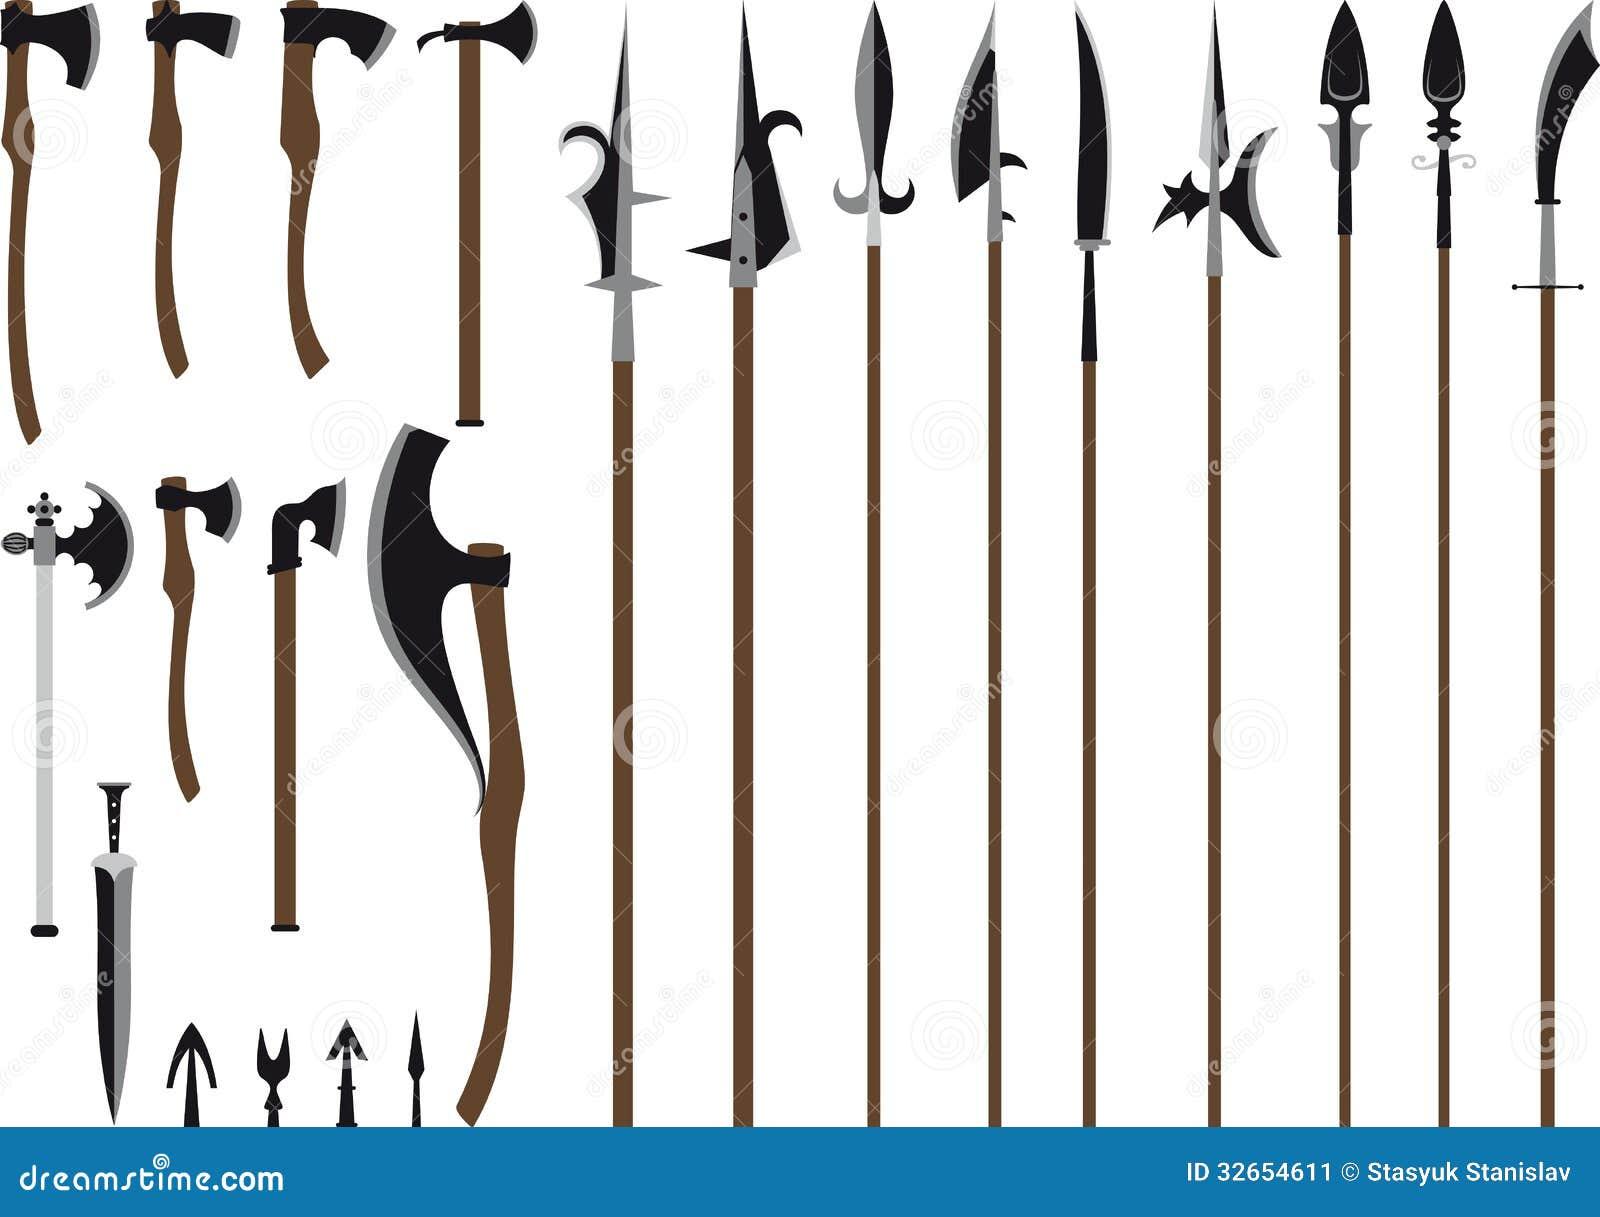 Cool sword weapon big weapon set